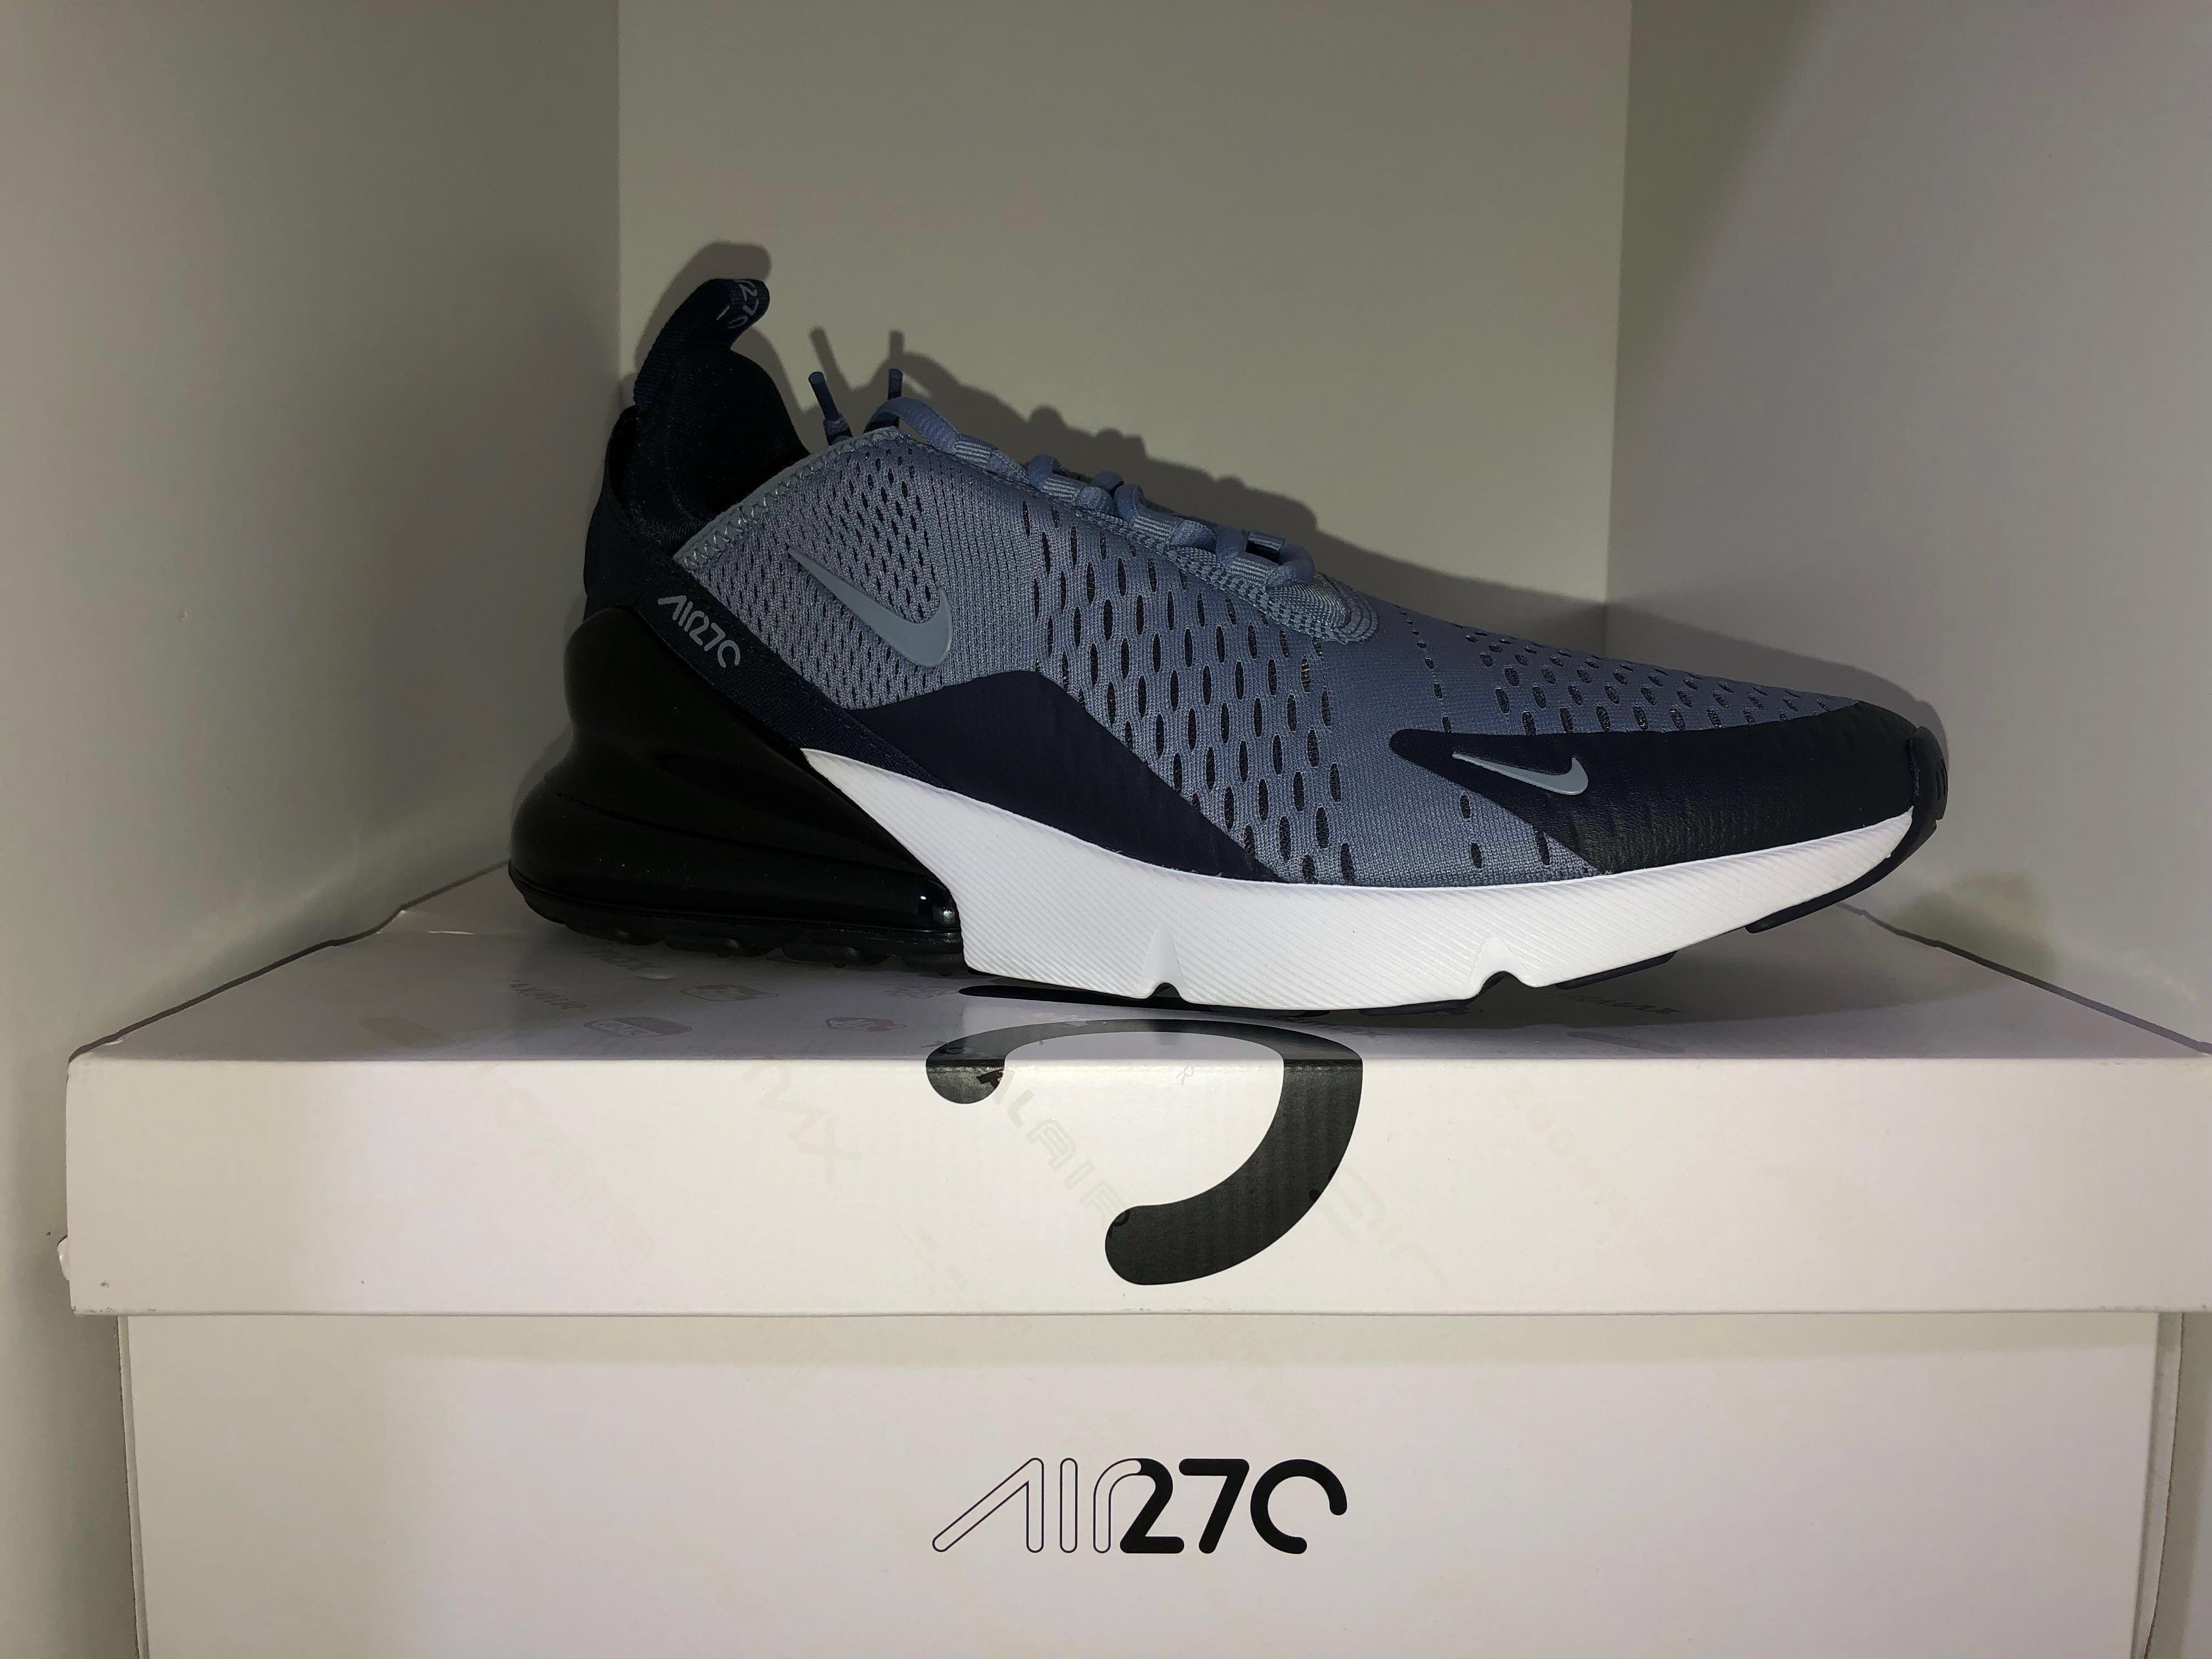 dbee40aa7d Nike Airmax 270, Men's Fashion, Footwear, Sneakers on Carousell